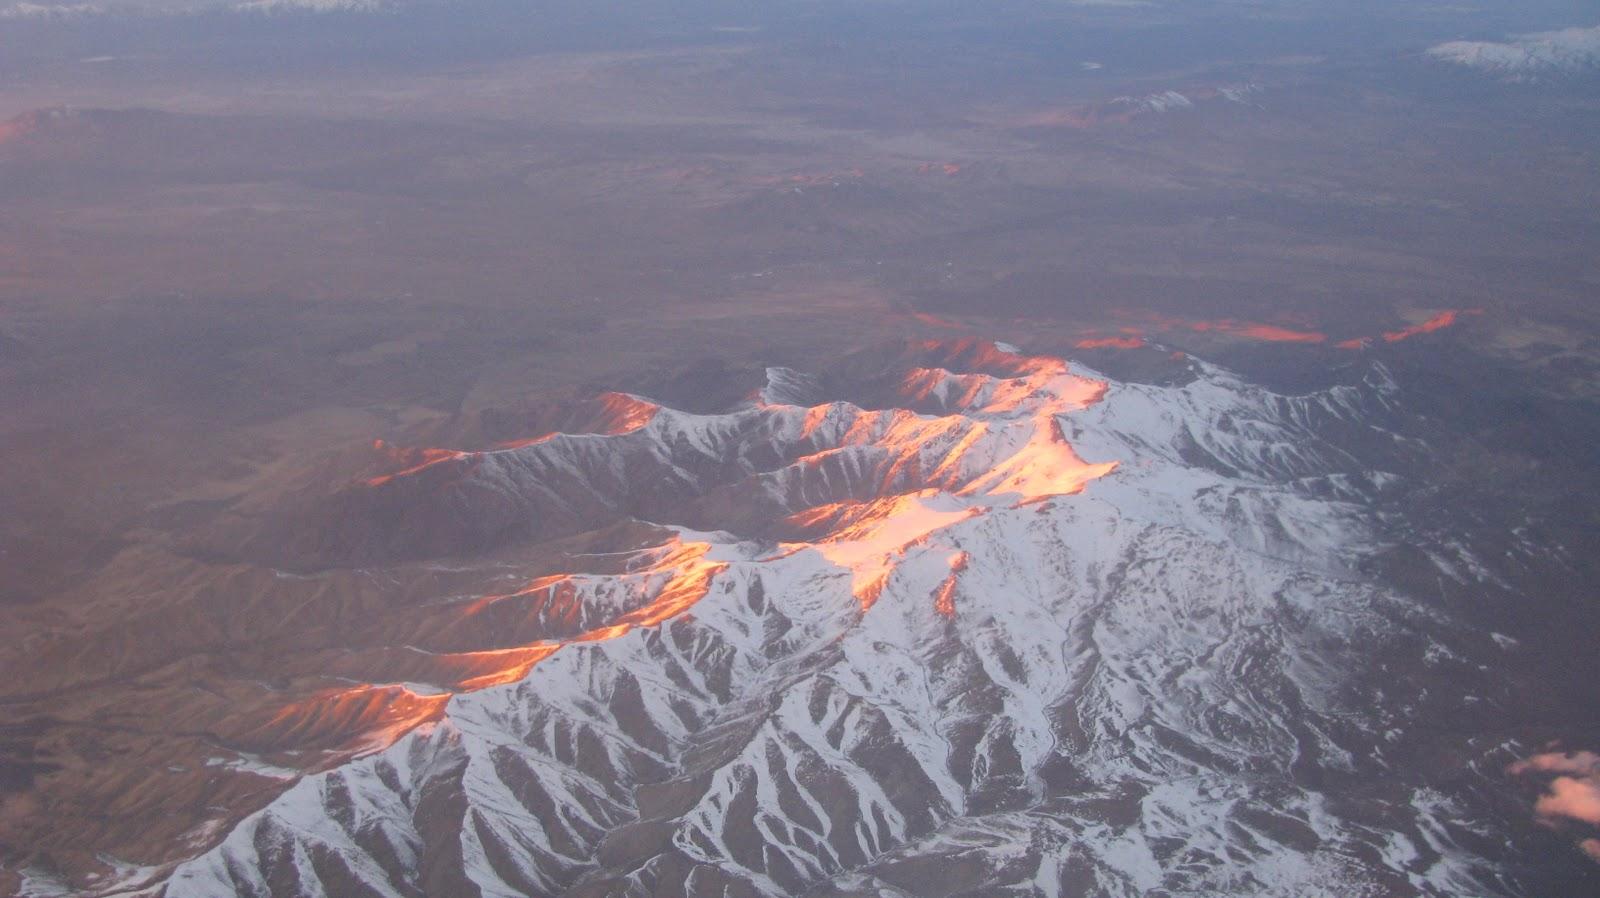 http://4.bp.blogspot.com/-8ulFFxUJg_k/Tt8wlVgS25I/AAAAAAAAFx8/GzbDWAkT3Dg/s1600/Amazing+Volcanic+Eruptions6.JPG